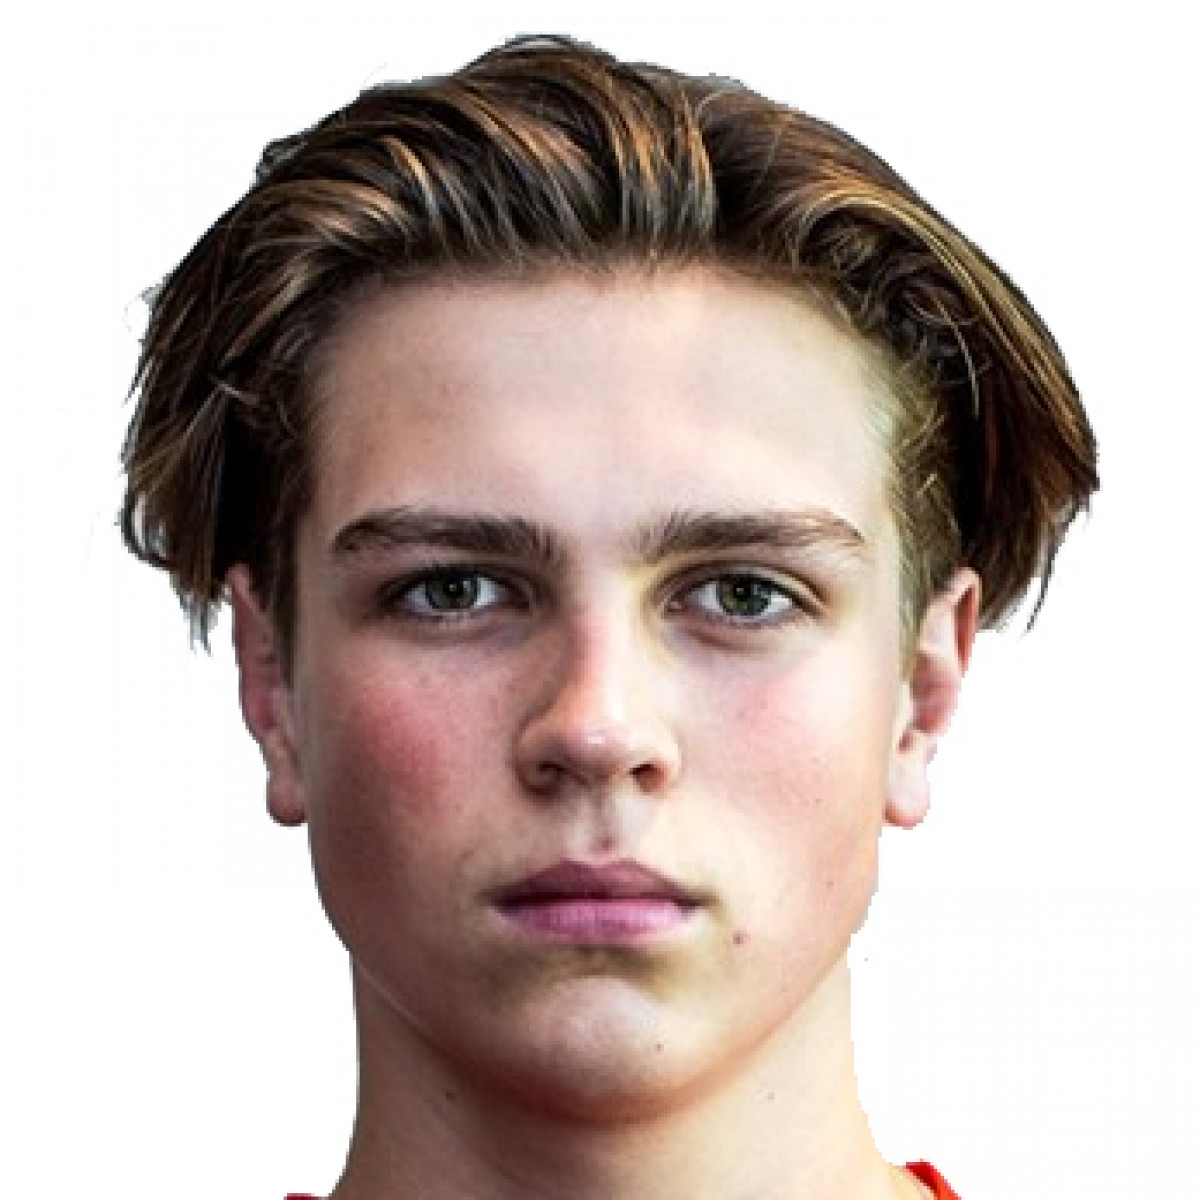 Magnus Llarsen